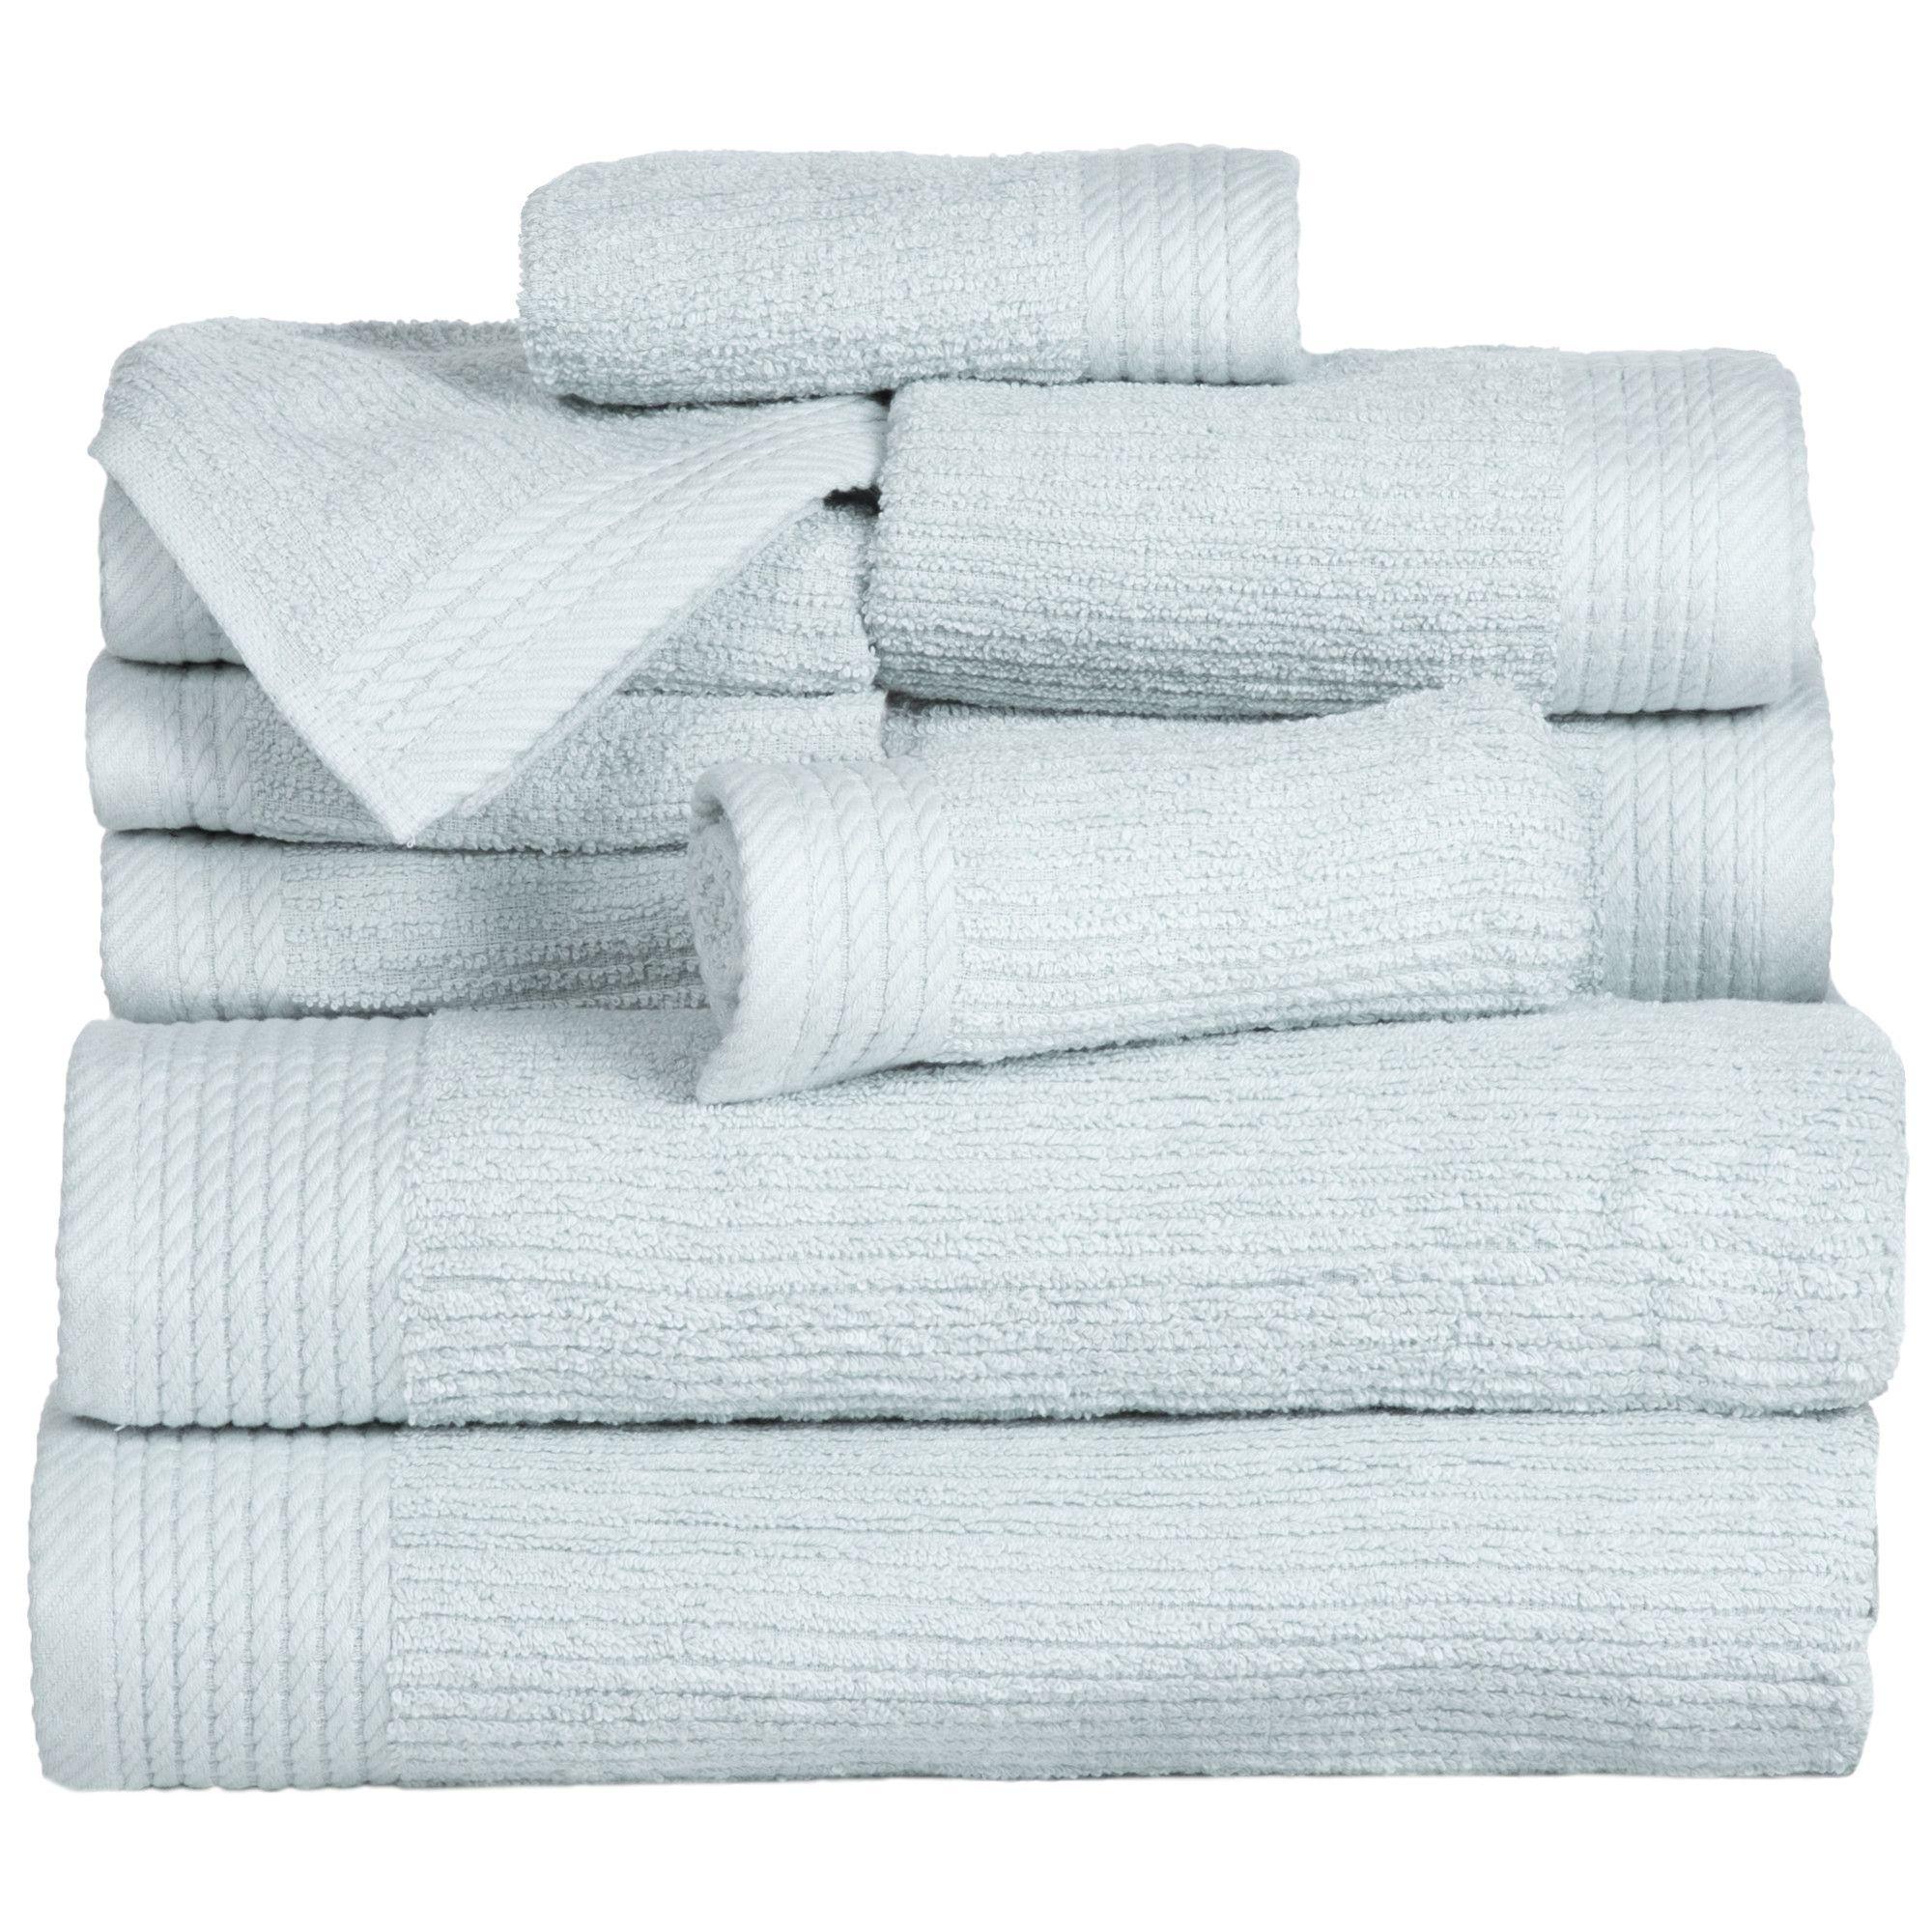 Pernelia 10 Piece 100 Egyptian Quality Cotton Towel Set Towel